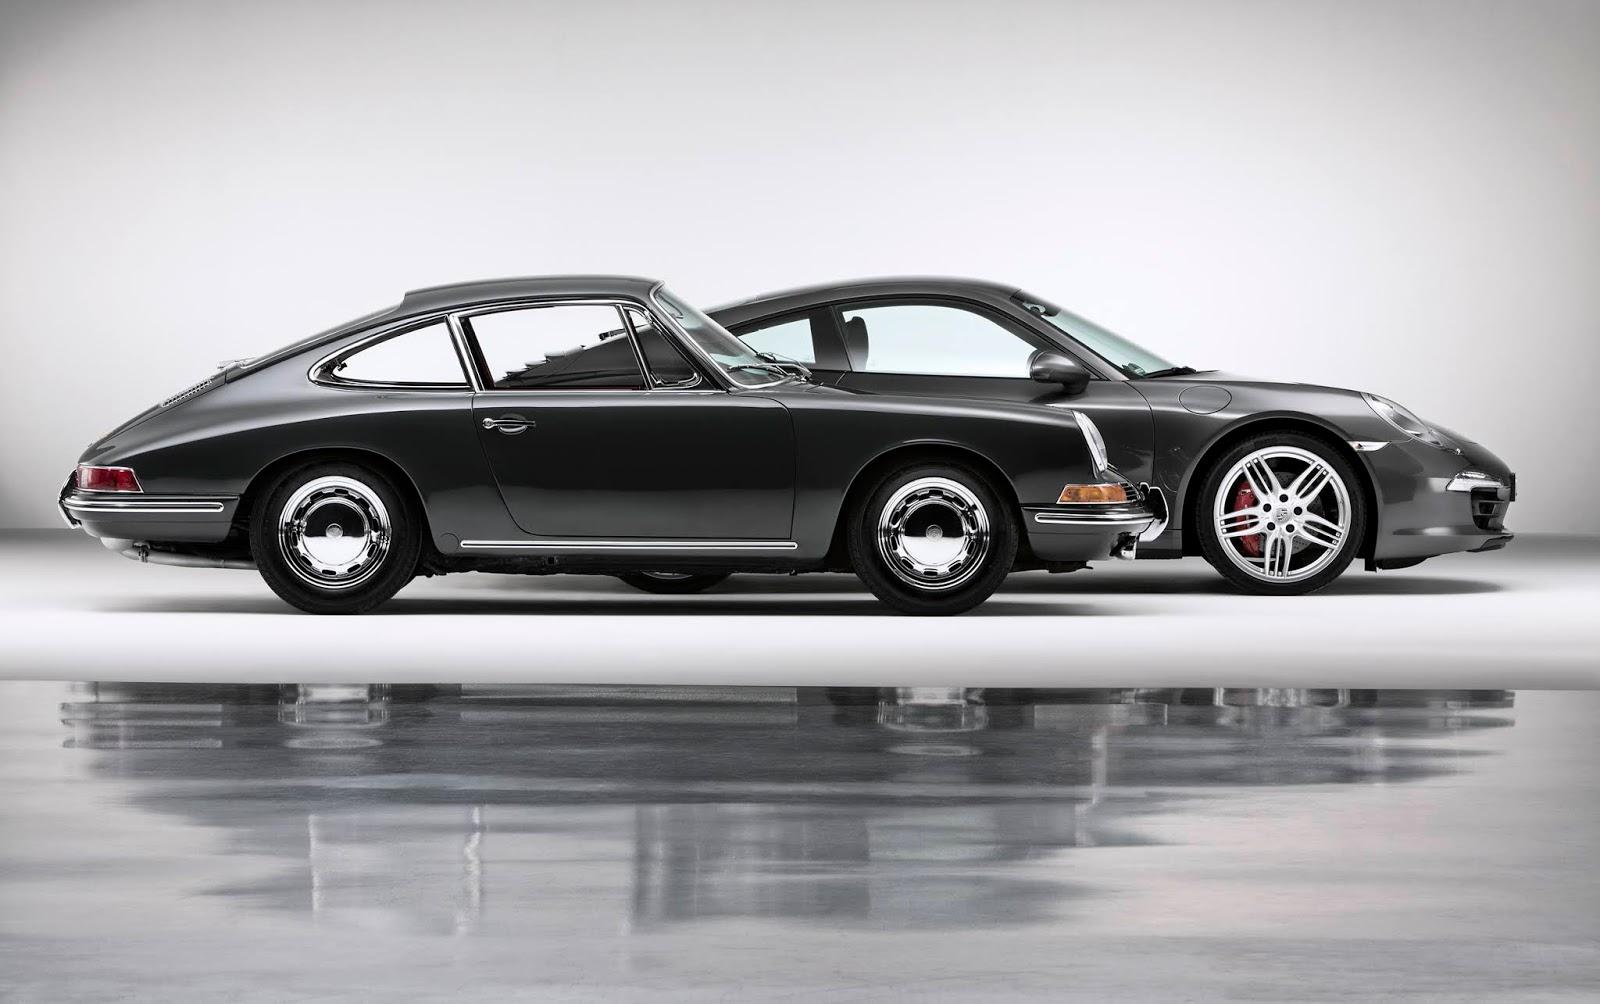 porc1 Πόσο πιο γρήγορη είναι μια καινούρια Porsche 911 από μια παλιά; Nurburgring, Porsche, Porsche 911, Porsche 911 Turbo, video, videos, βίντεο